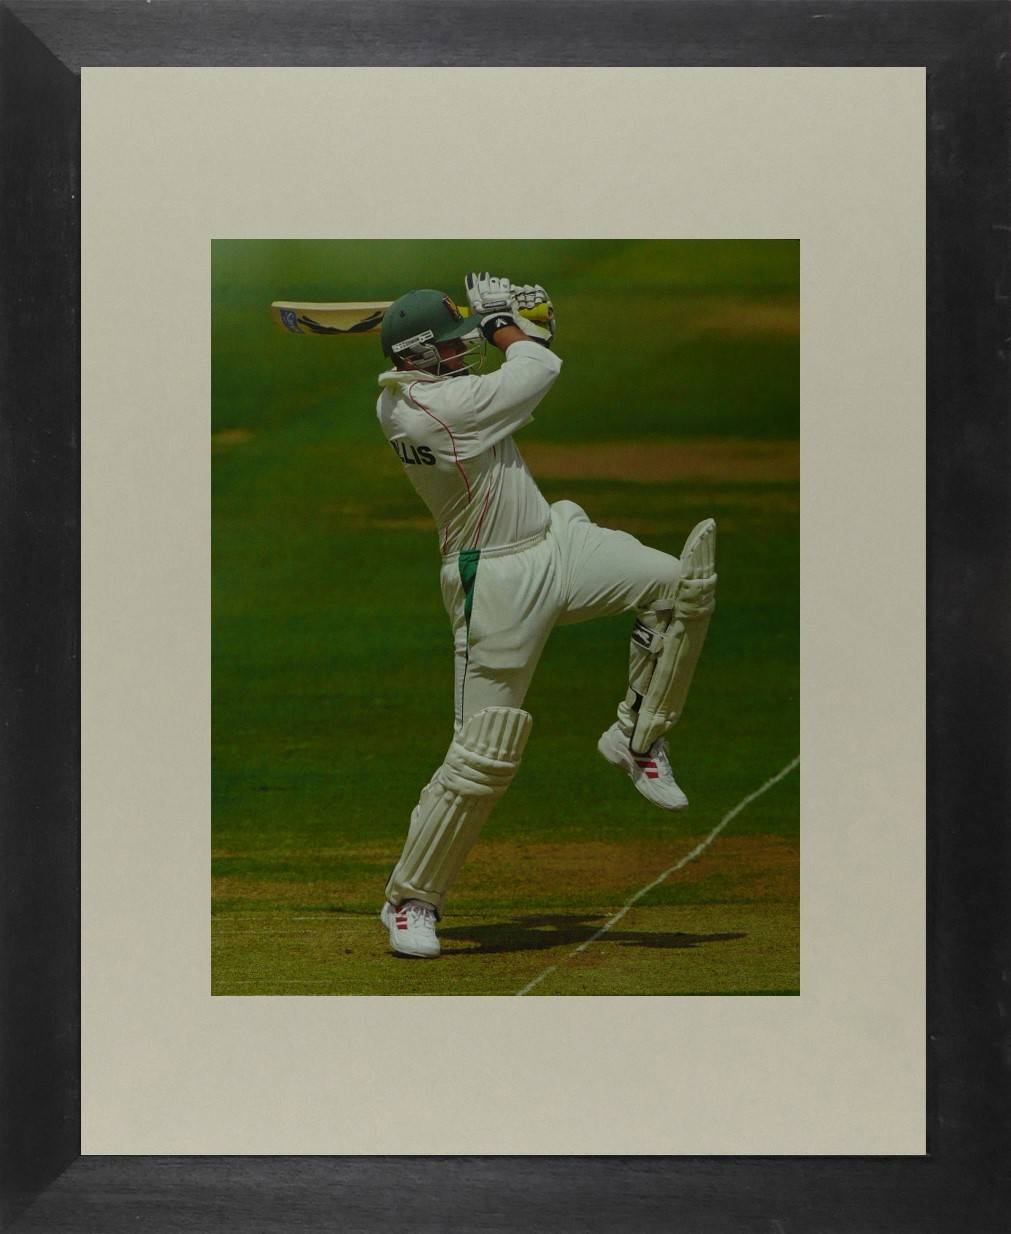 Bob Willis (Cricket) - Framed Picture 11 x 14